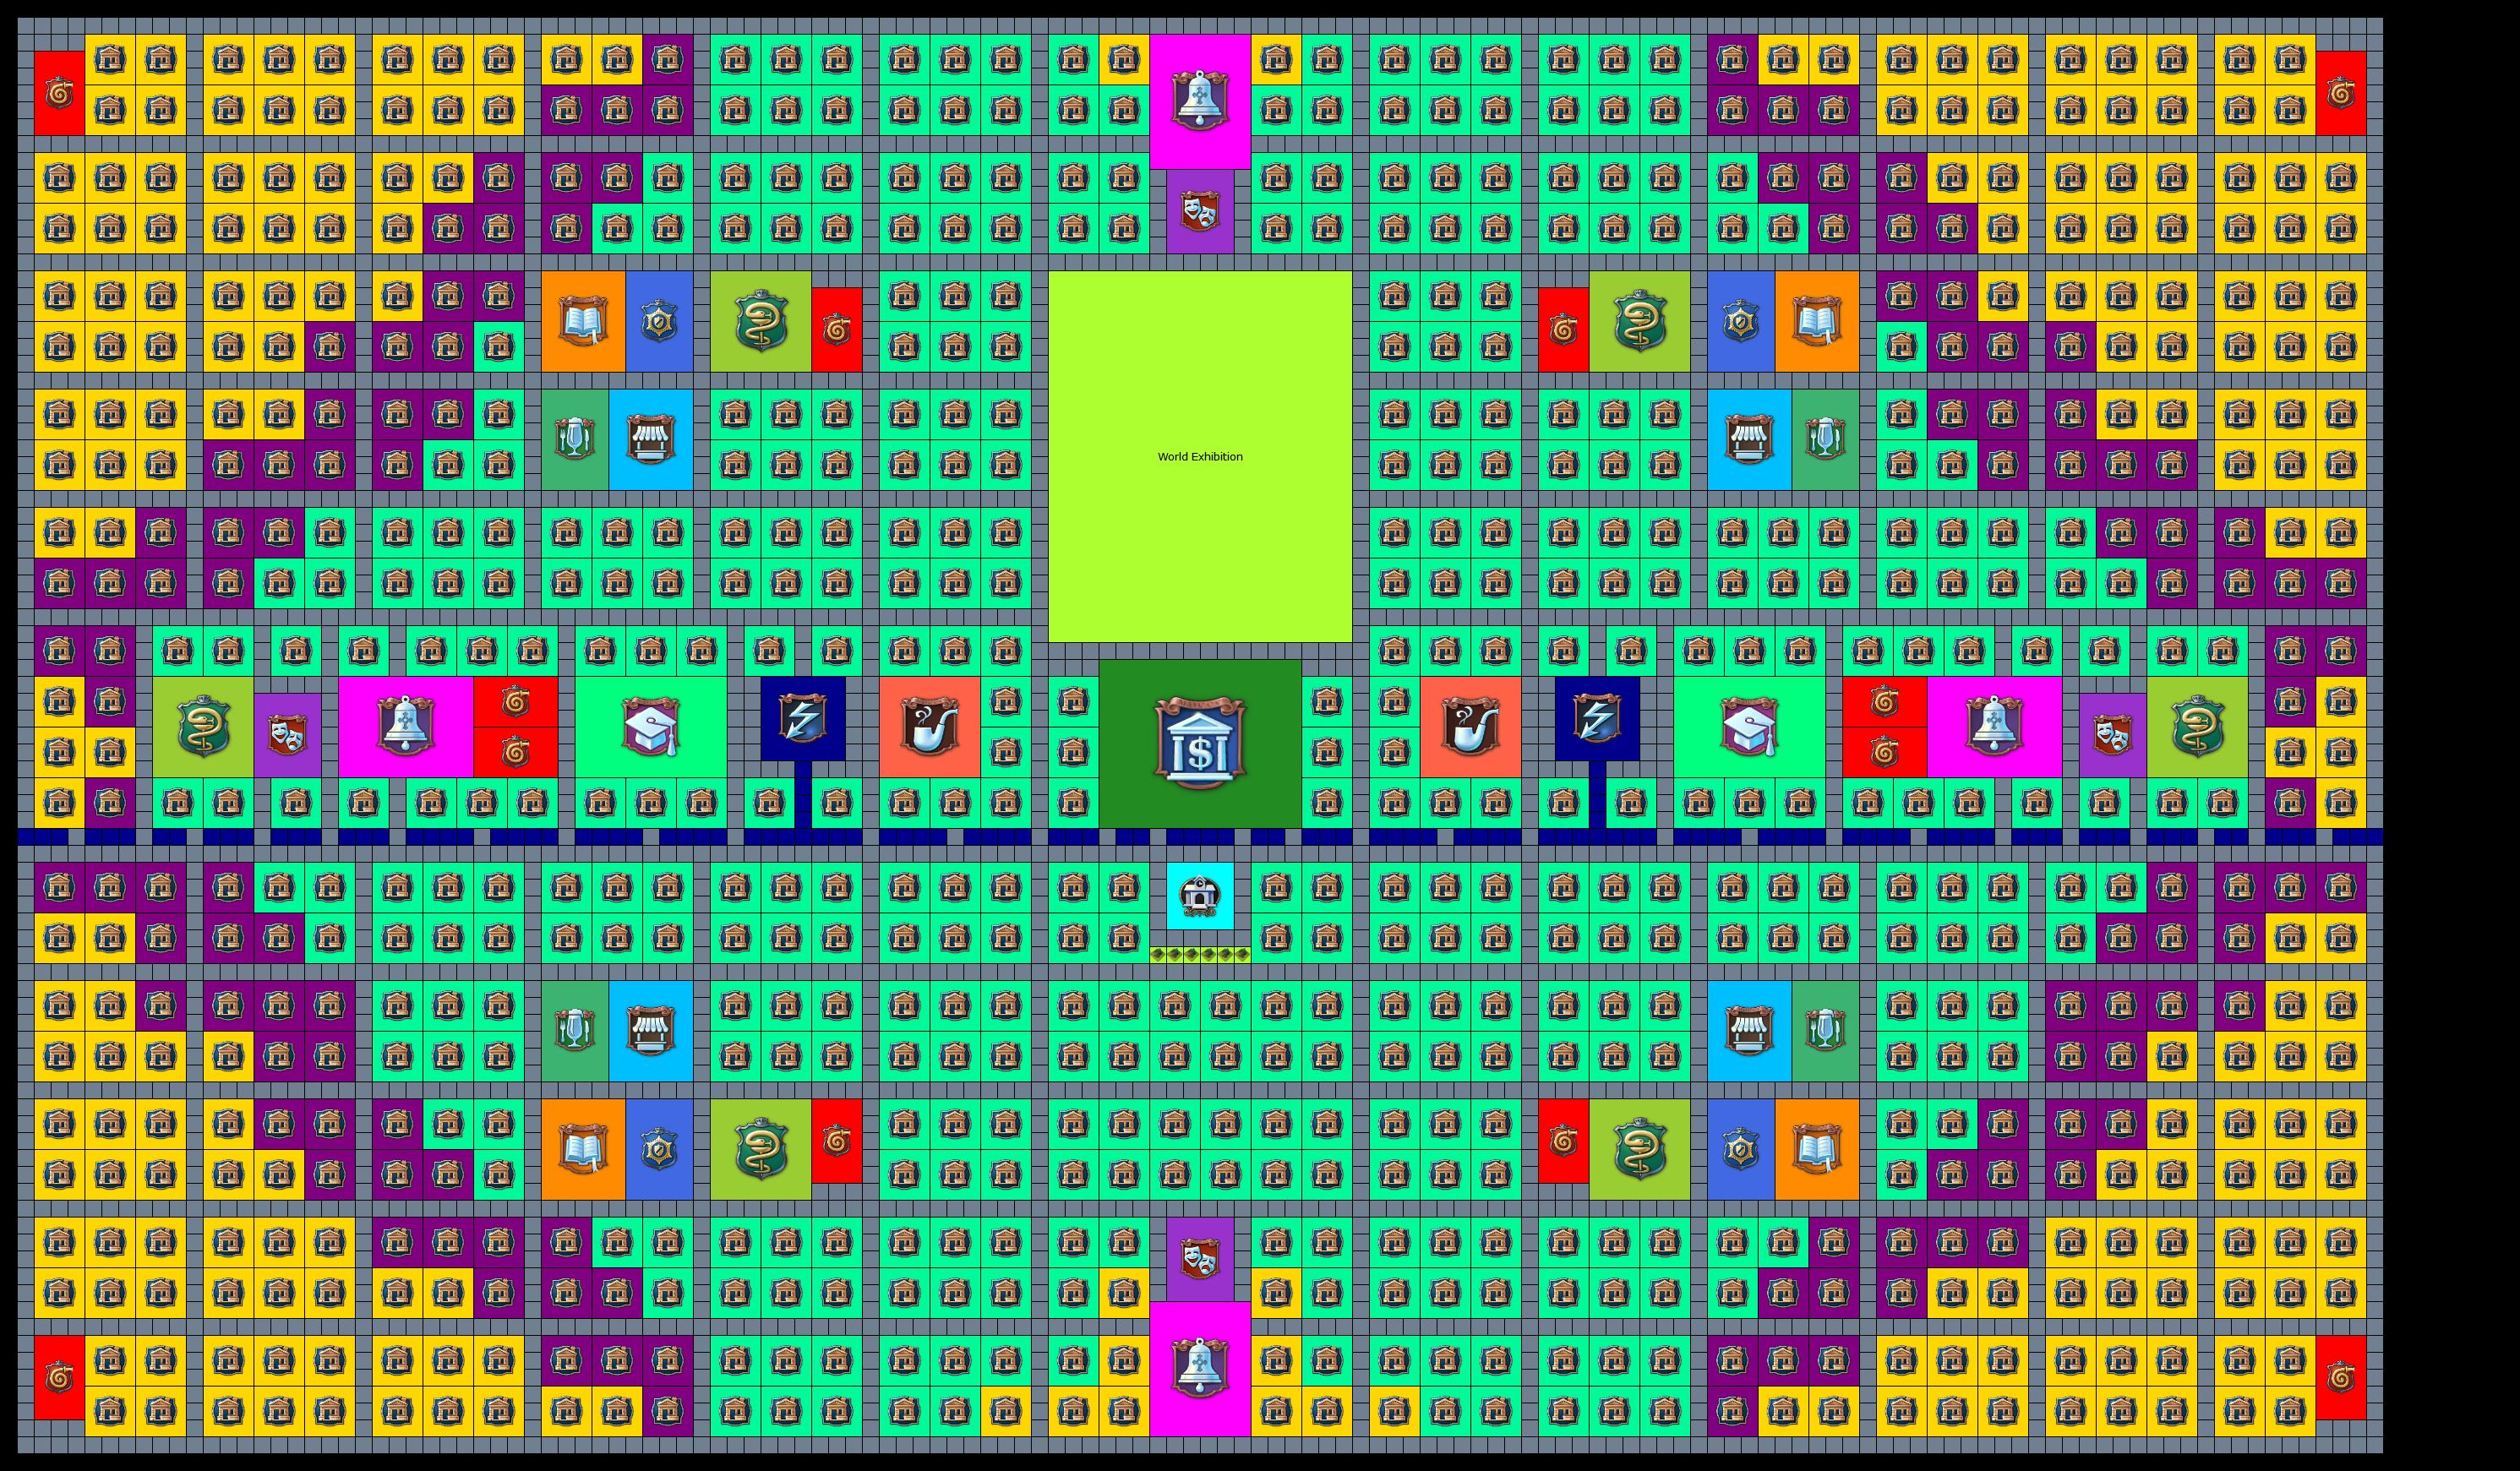 https://vignette.wikia.nocookie.net/anno1800/images/d/d1/Diamond_City_T5_with_WE.png